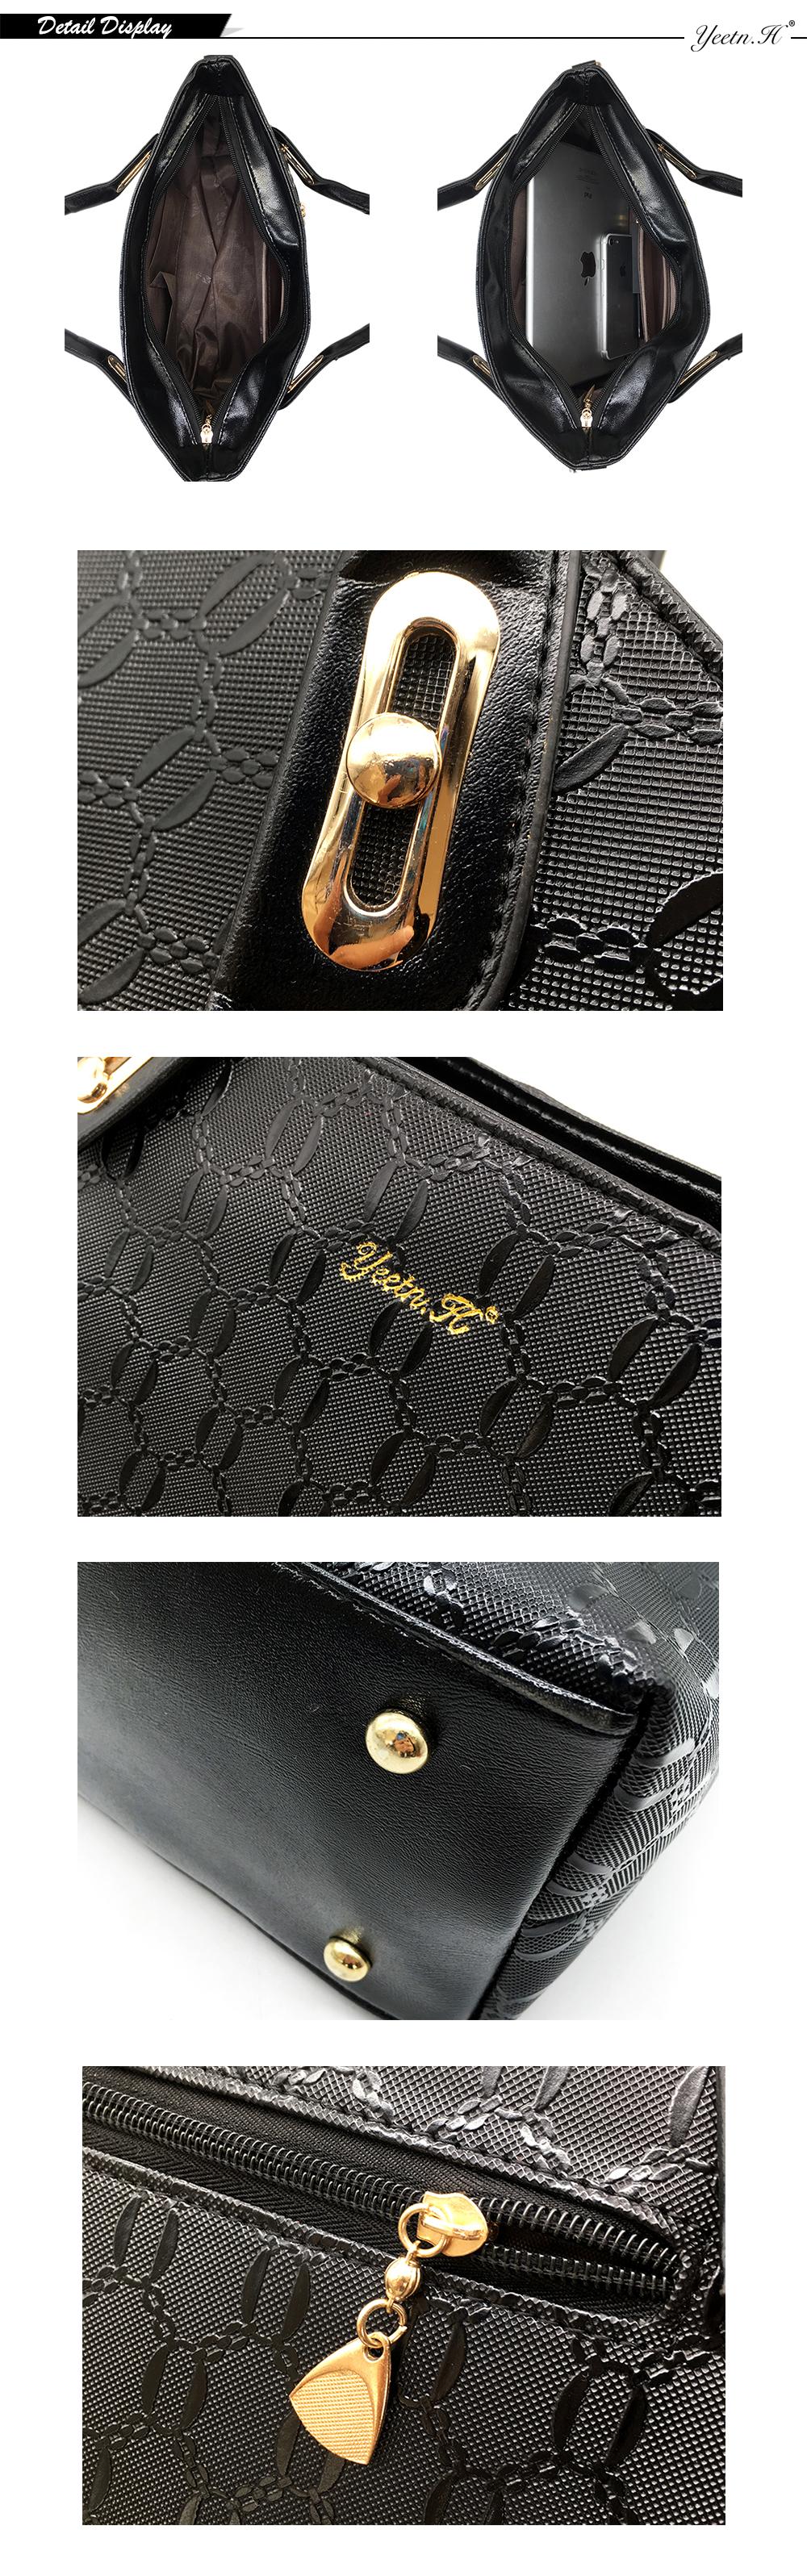 Yeetn.H Women 4 Set Handbags Pu Leather Fashion Designer Handbag Shoulder Bag Black Vintage Female Messenger Bag Sac A Main M129 4